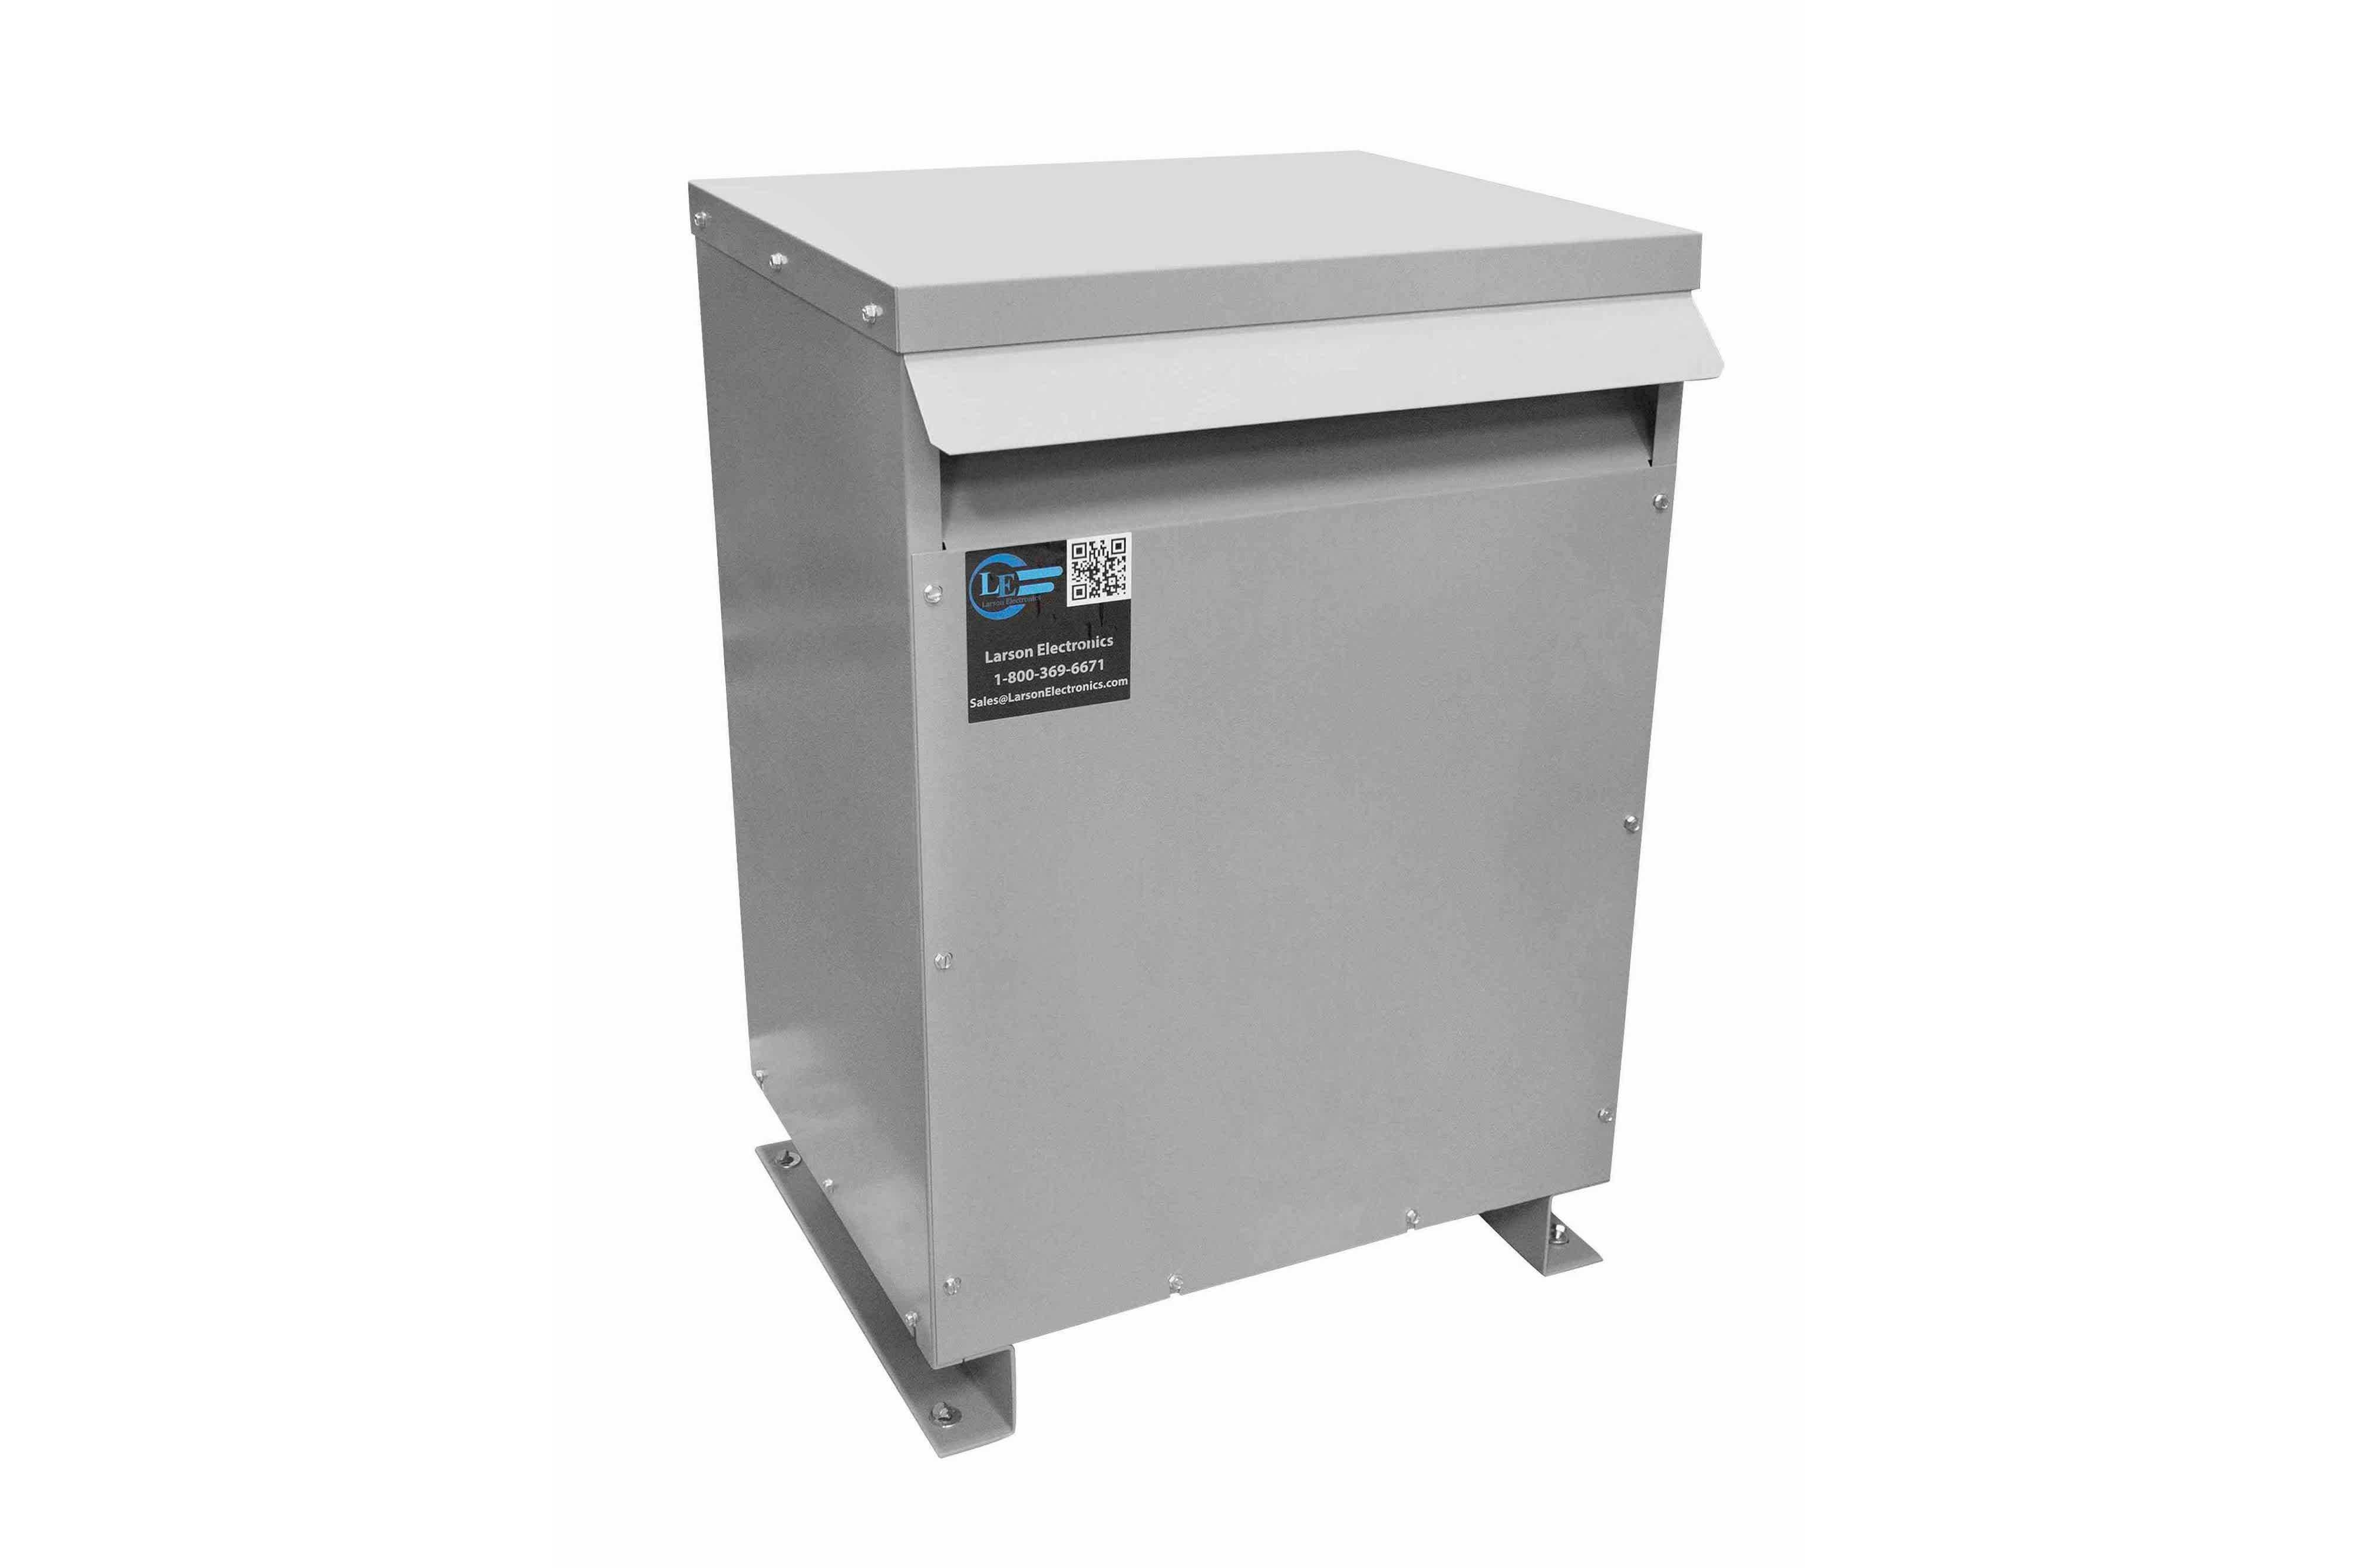 28 kVA 3PH Isolation Transformer, 460V Wye Primary, 600V Delta Secondary, N3R, Ventilated, 60 Hz